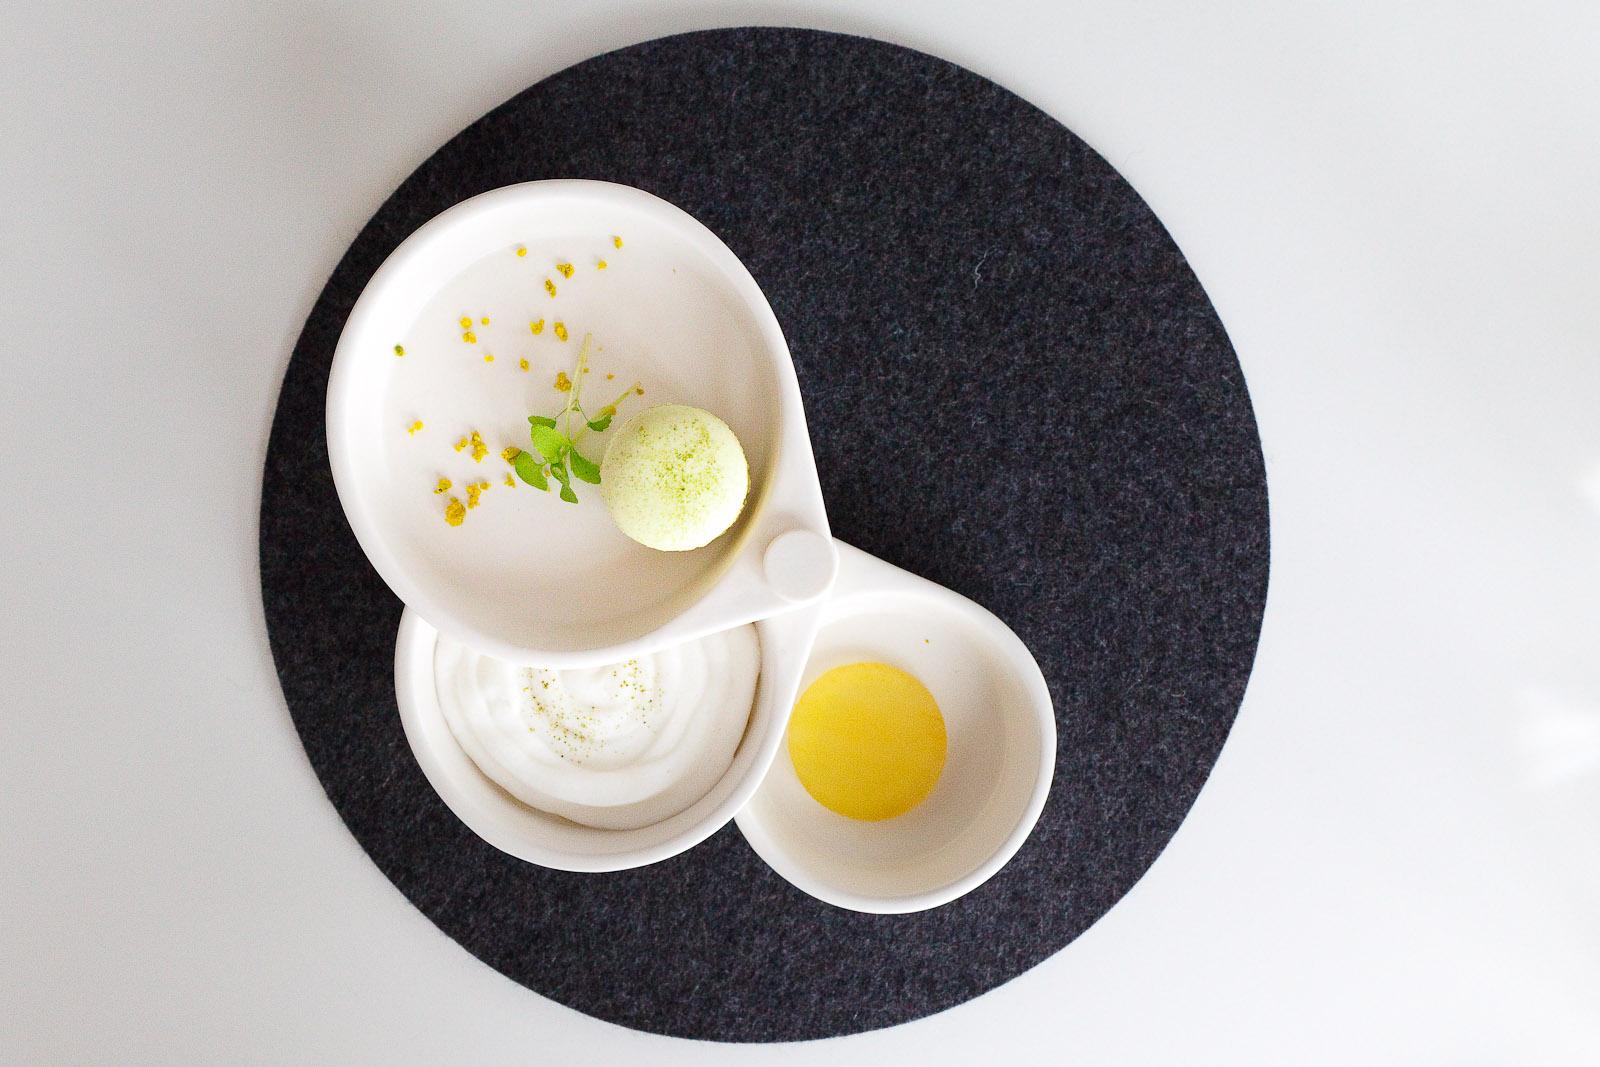 20th Course: Matcha tea - matcha macaron, apple foam with matcha, matcha-infused apple